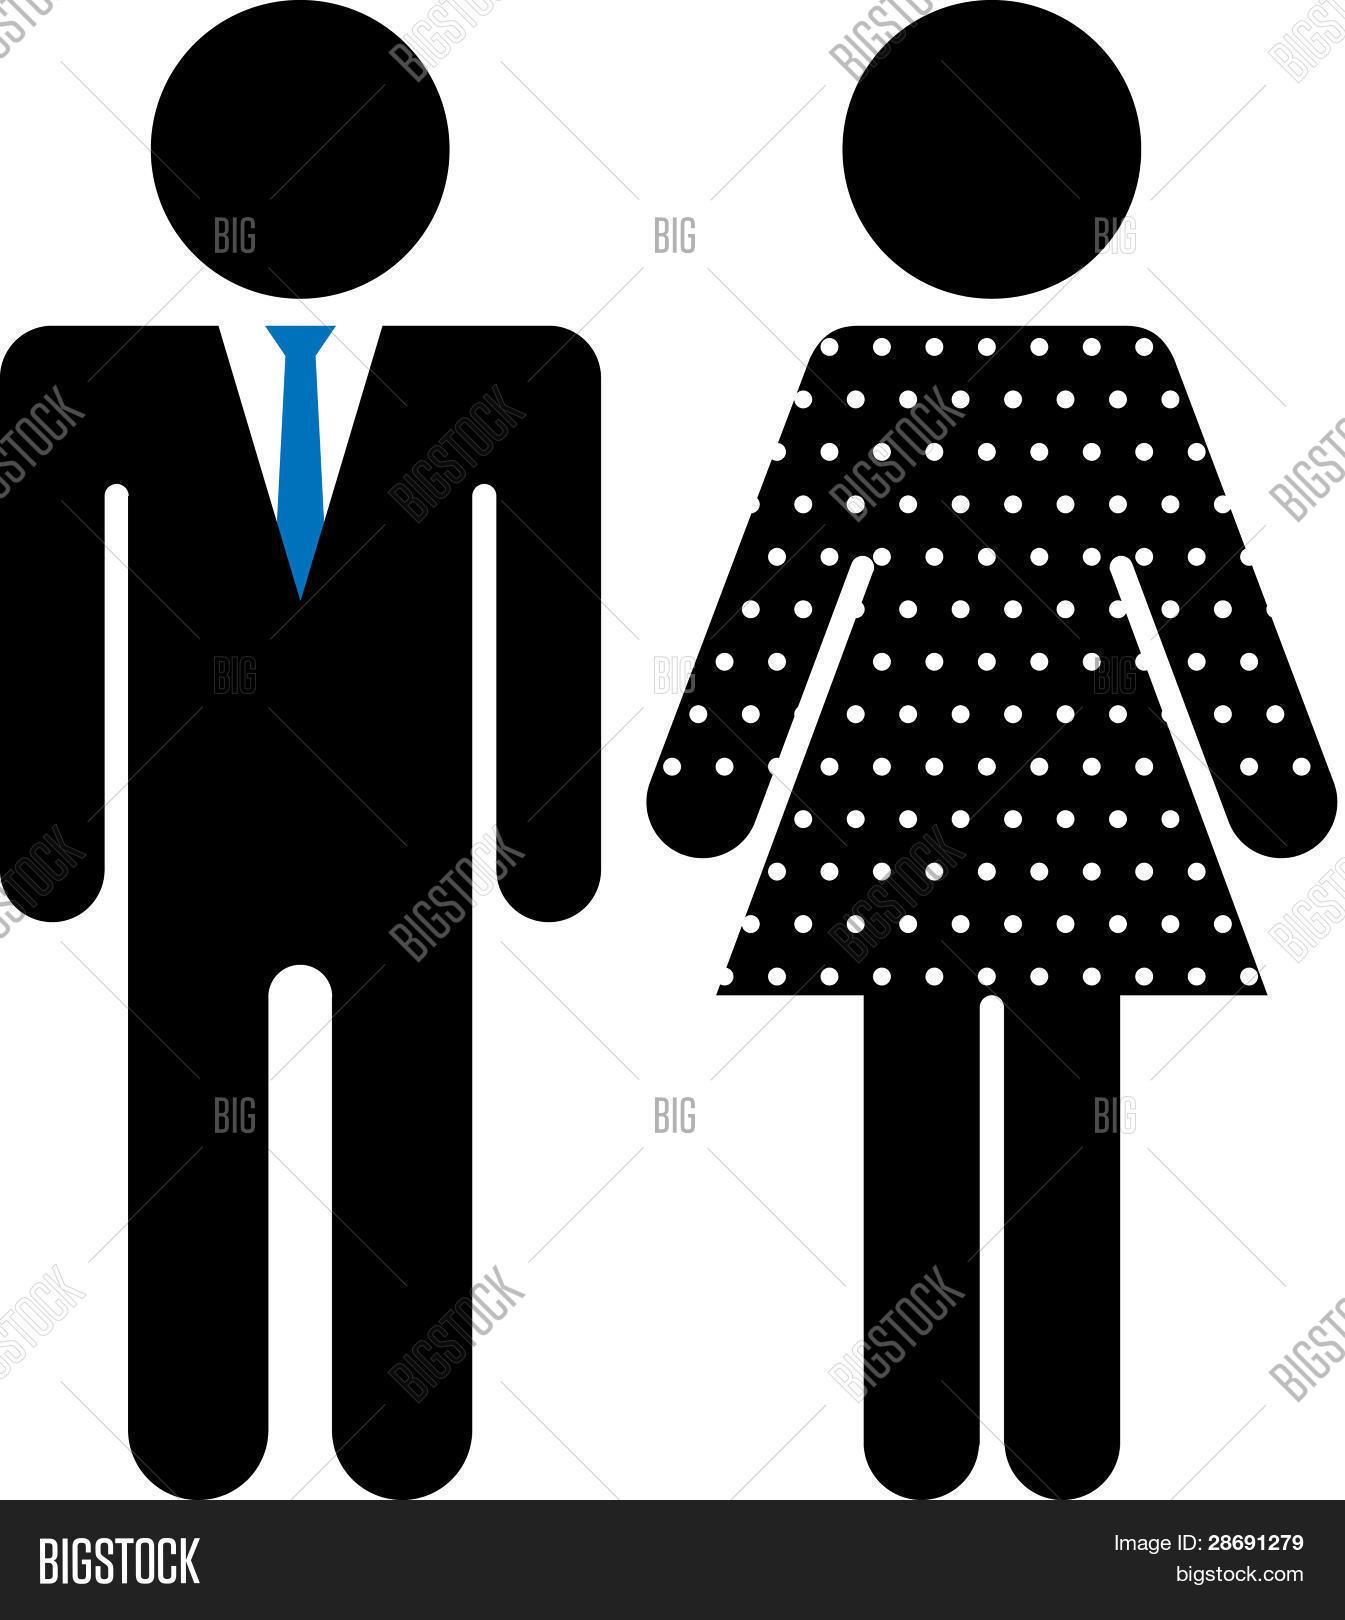 Símbolos formais de banheiro masculino e feminino Bancos de Vetores & Ban -> Logotipo Banheiro Feminino